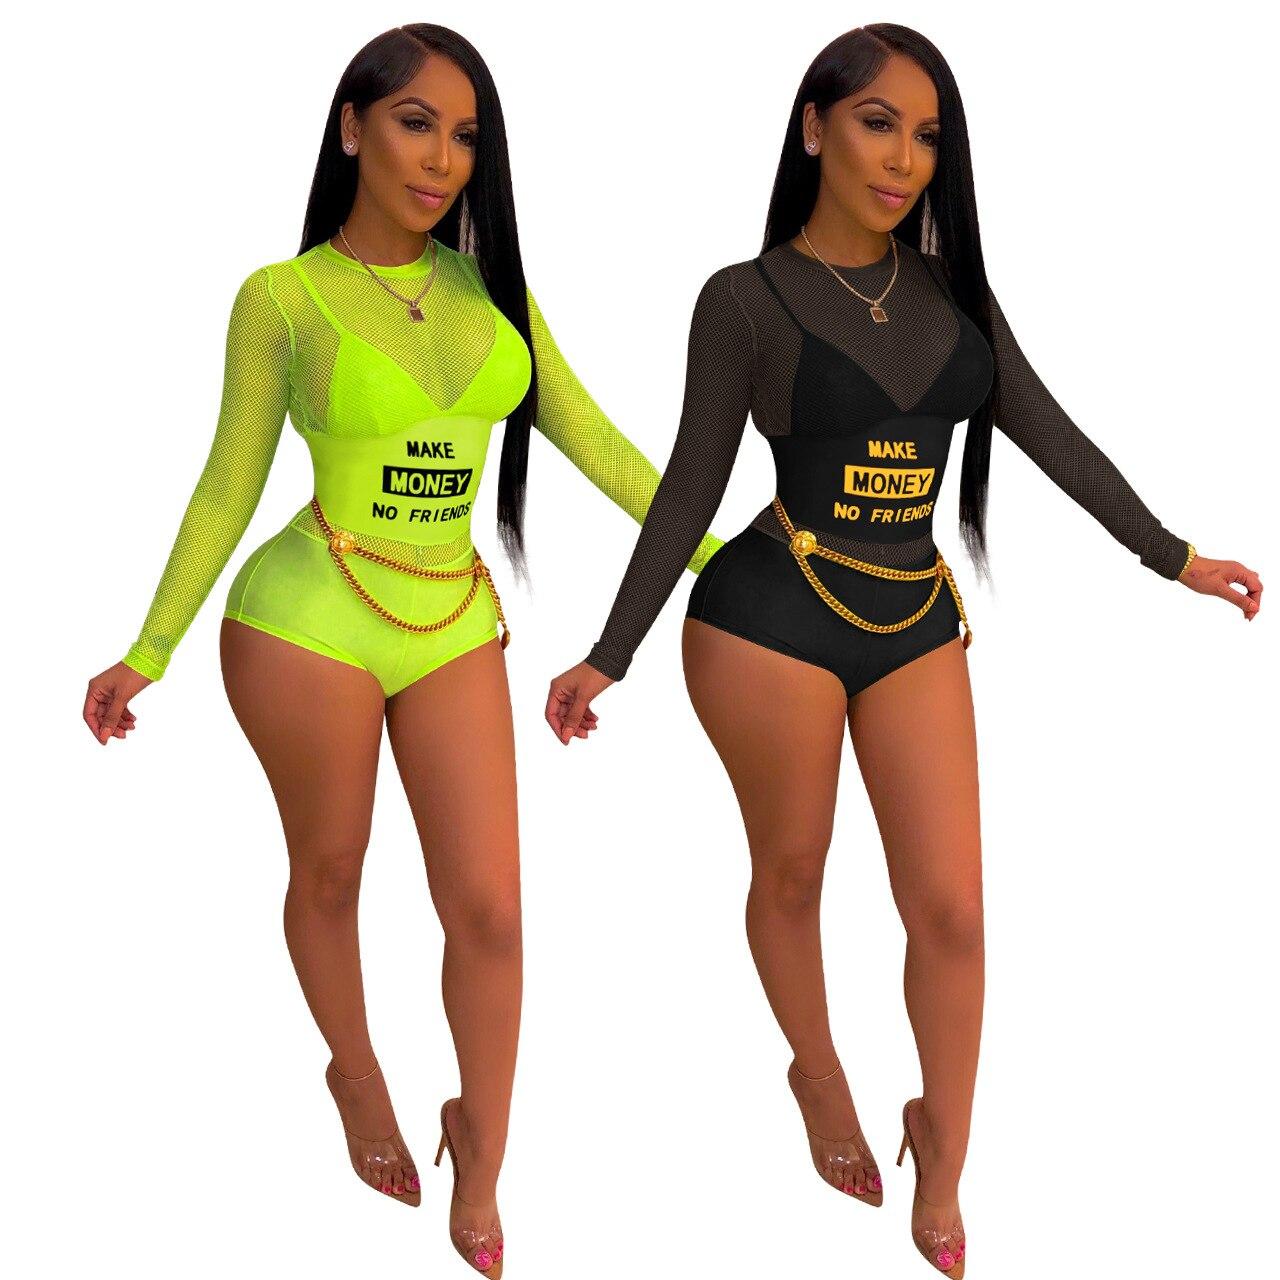 Echoine summer women sexy mesh see though make money no friends letter print open back bodysuit fashion swimsuit romper overalls